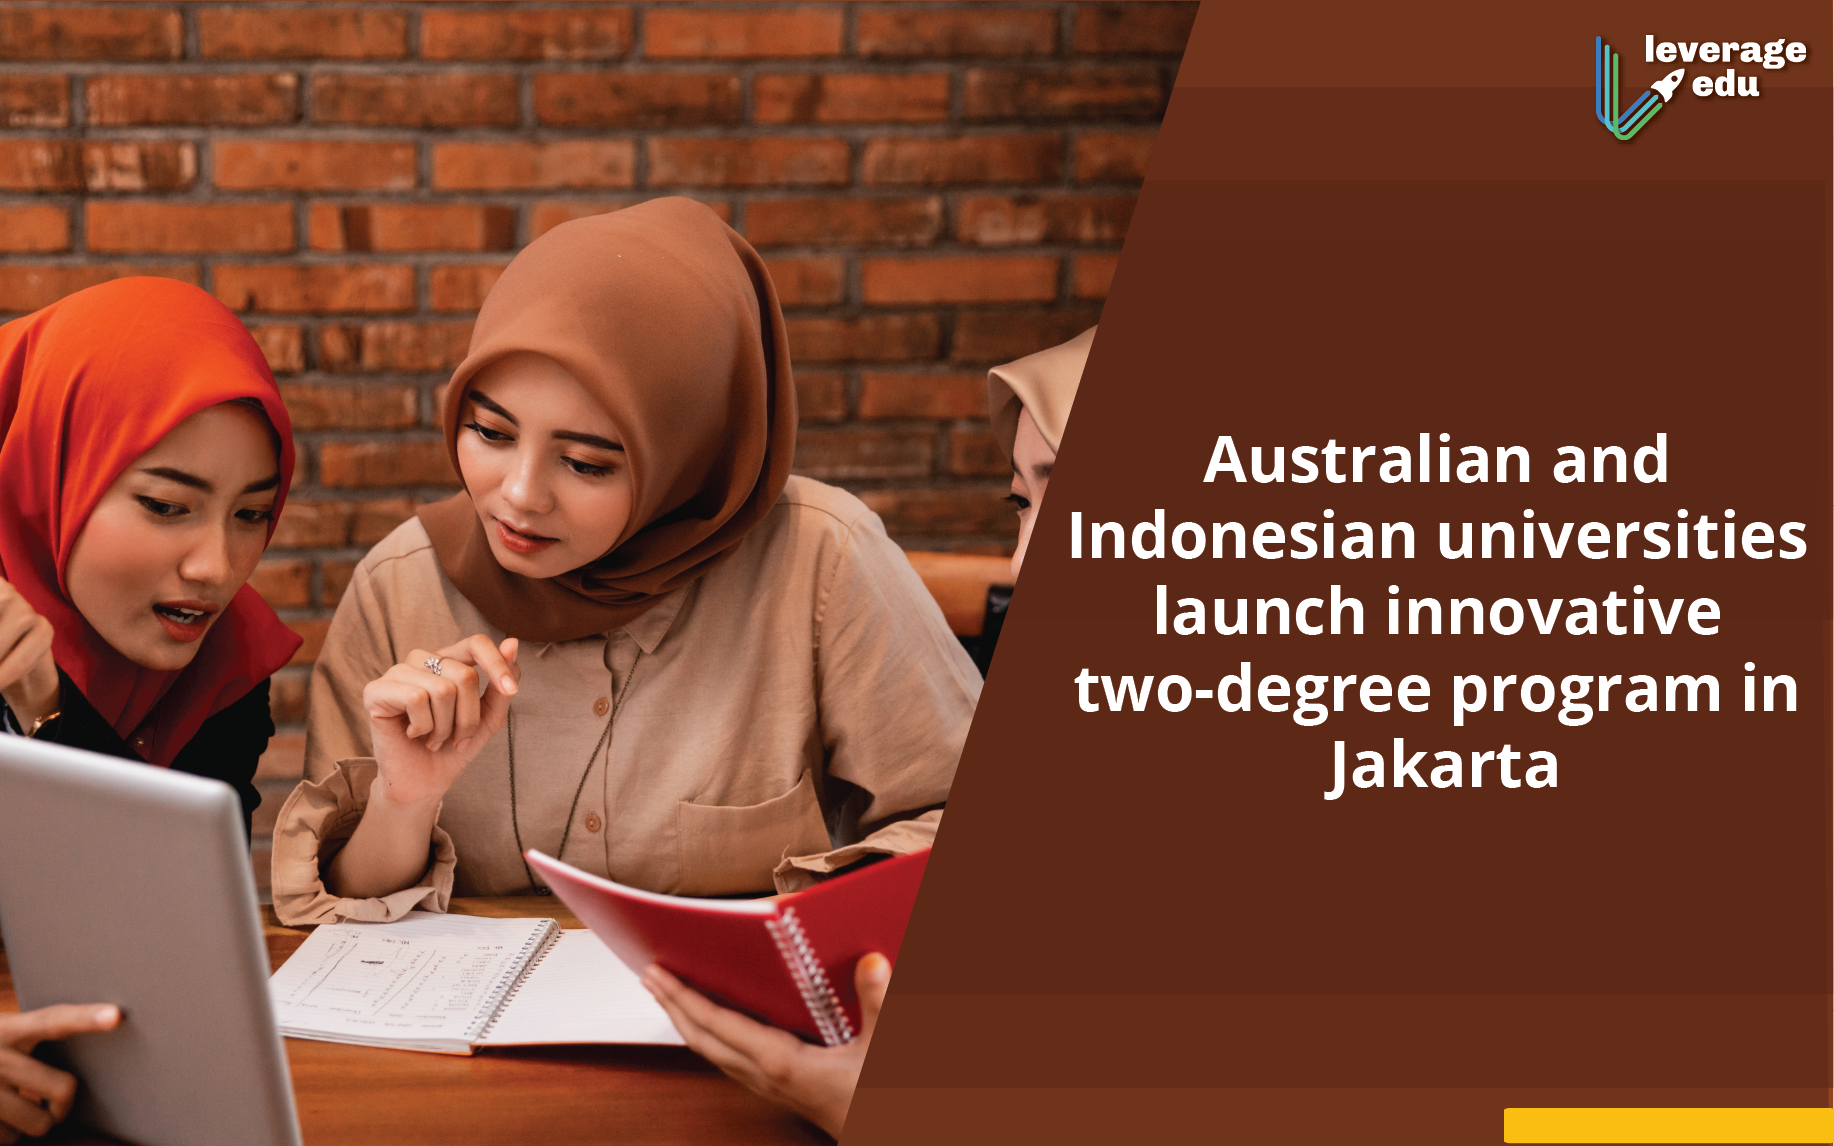 The University of Newcastle and Binus University Introduce a Joint Bachelor's Program